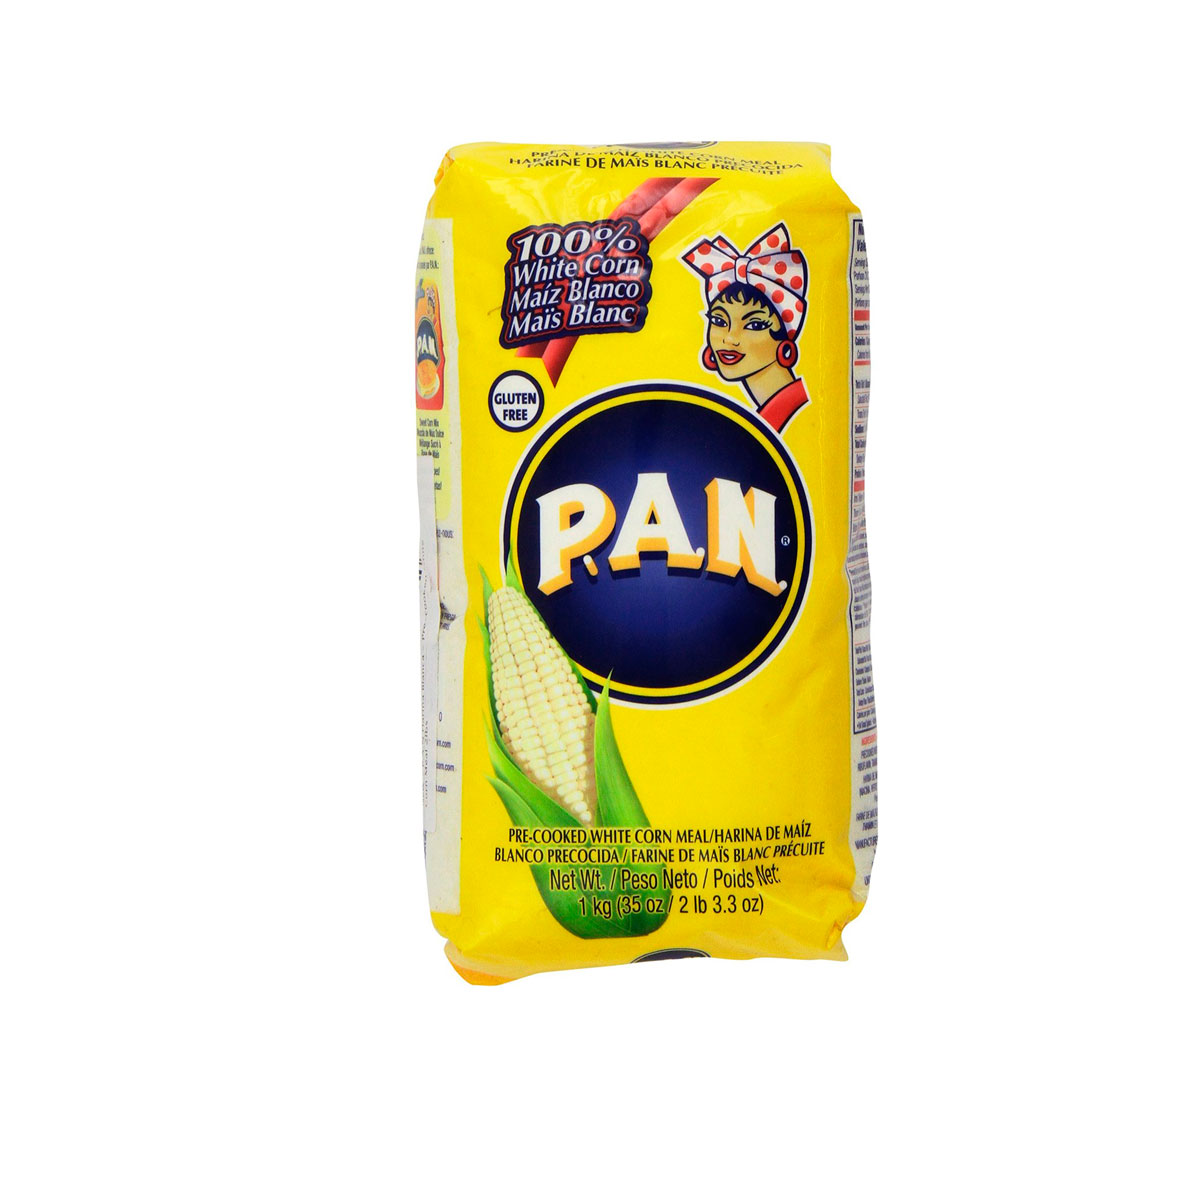 Retiro preventivo de la Harina PAN en Argentina